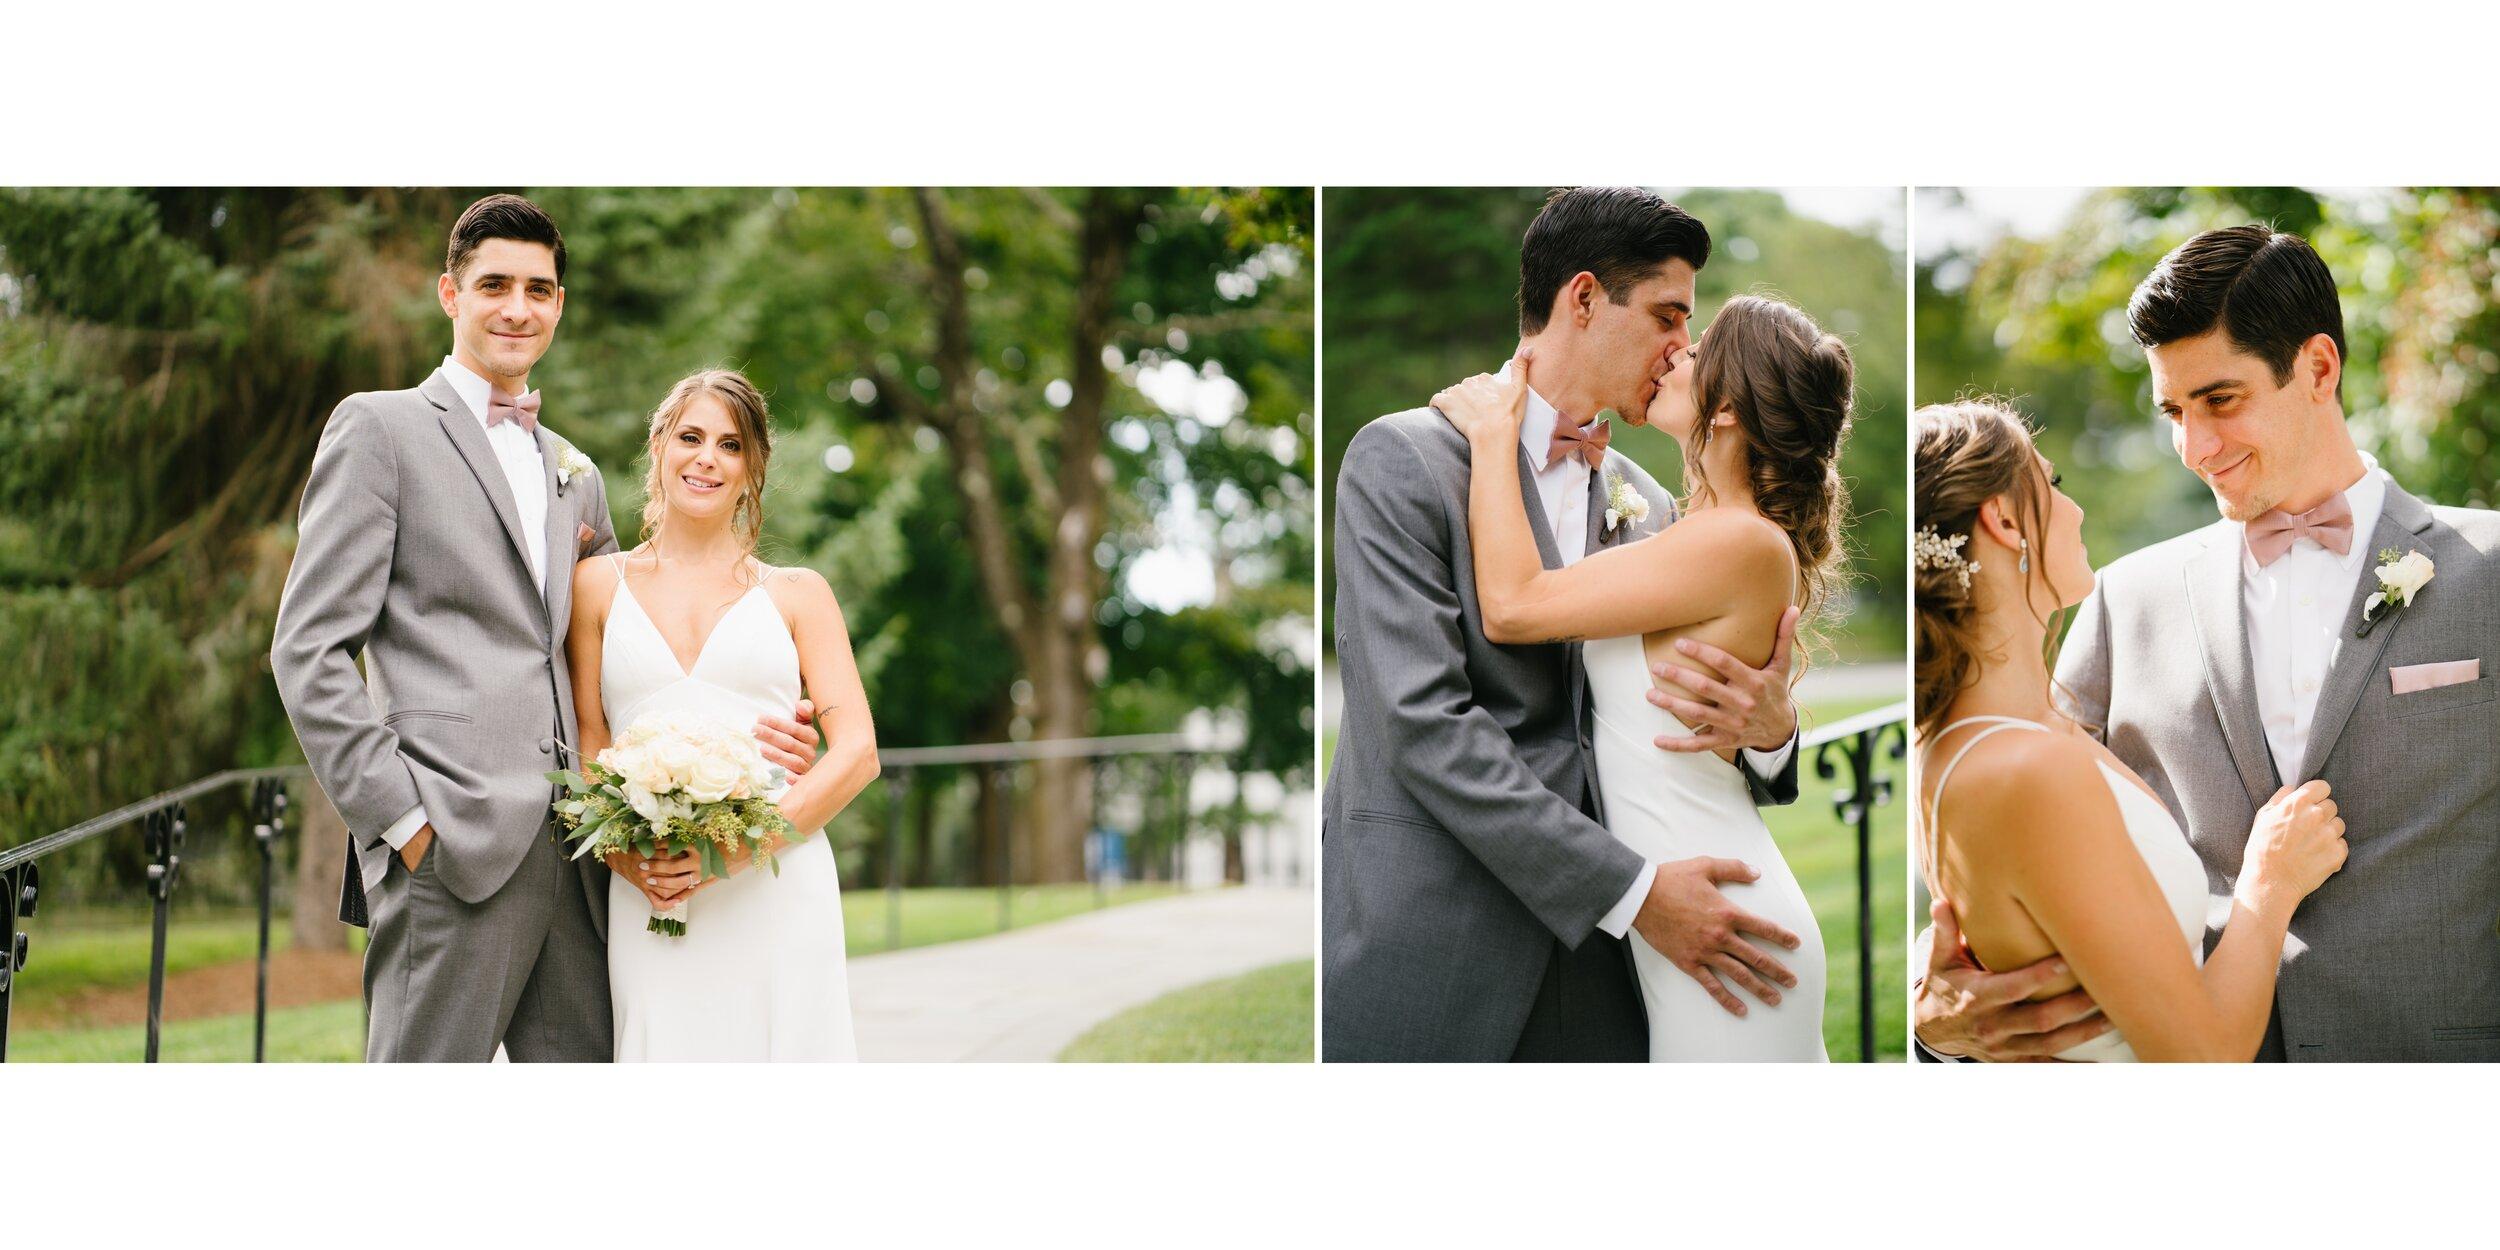 wedding at Lounsbury house